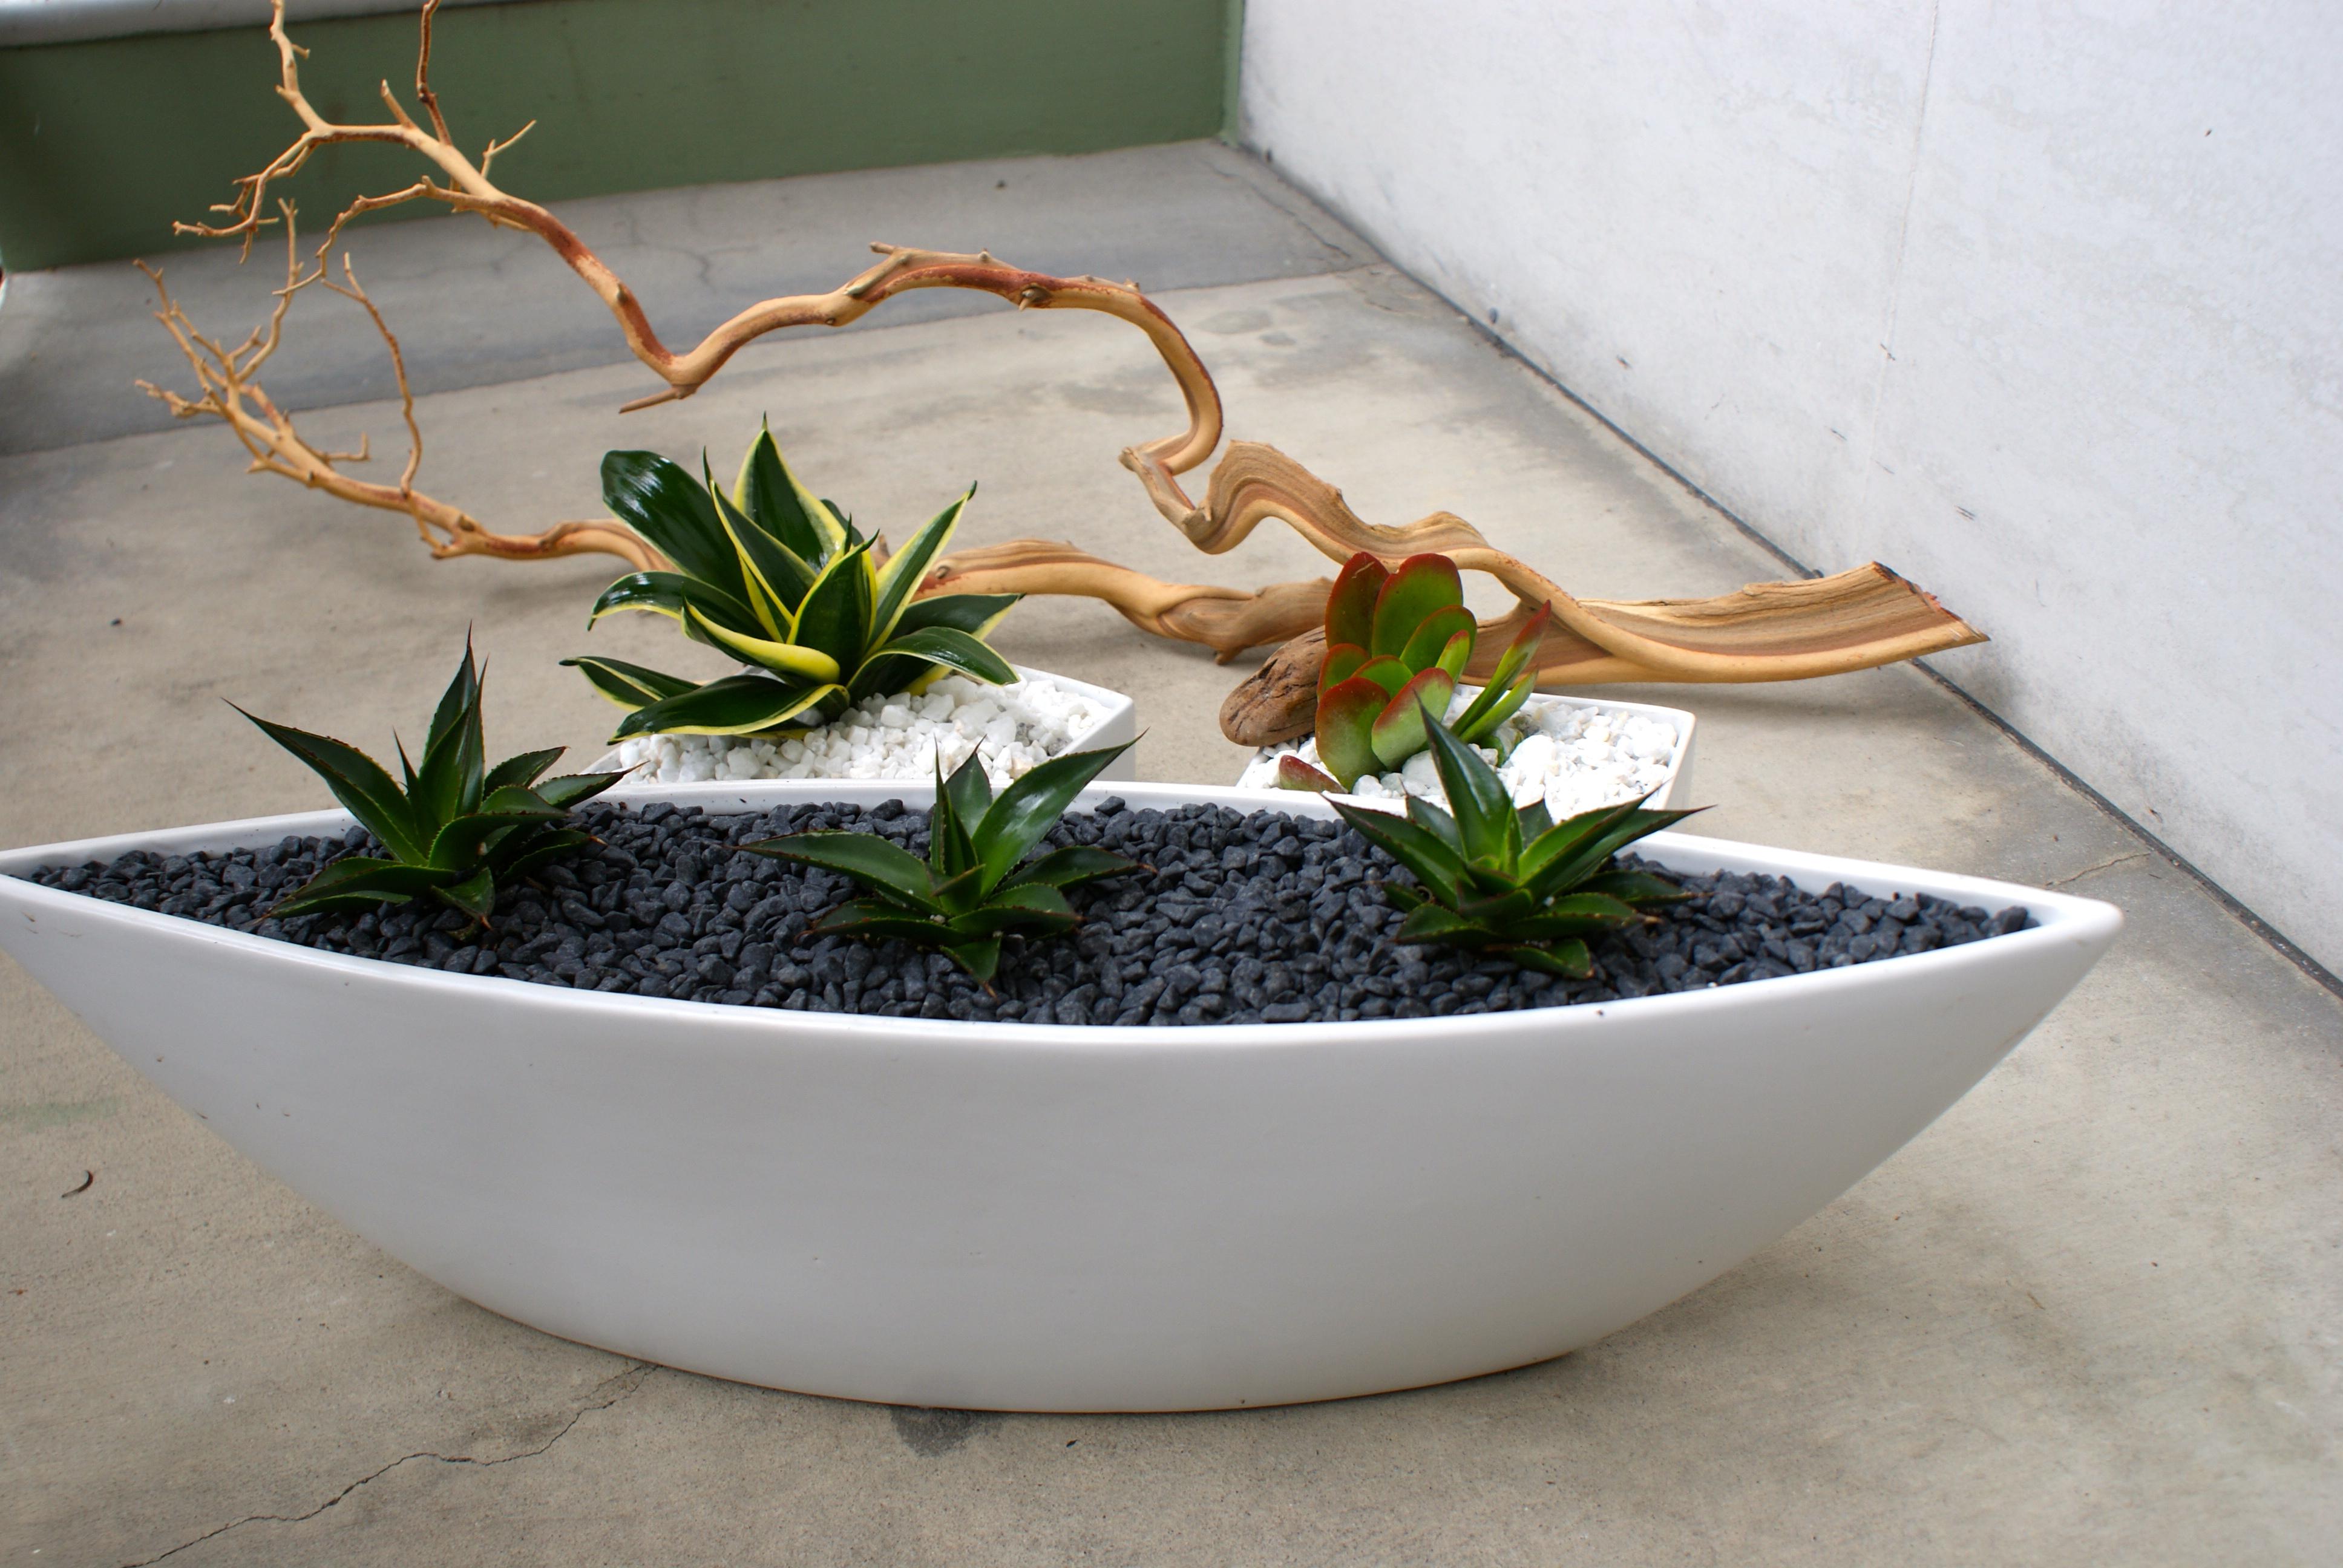 Succulent Plant Milkweed And Maple